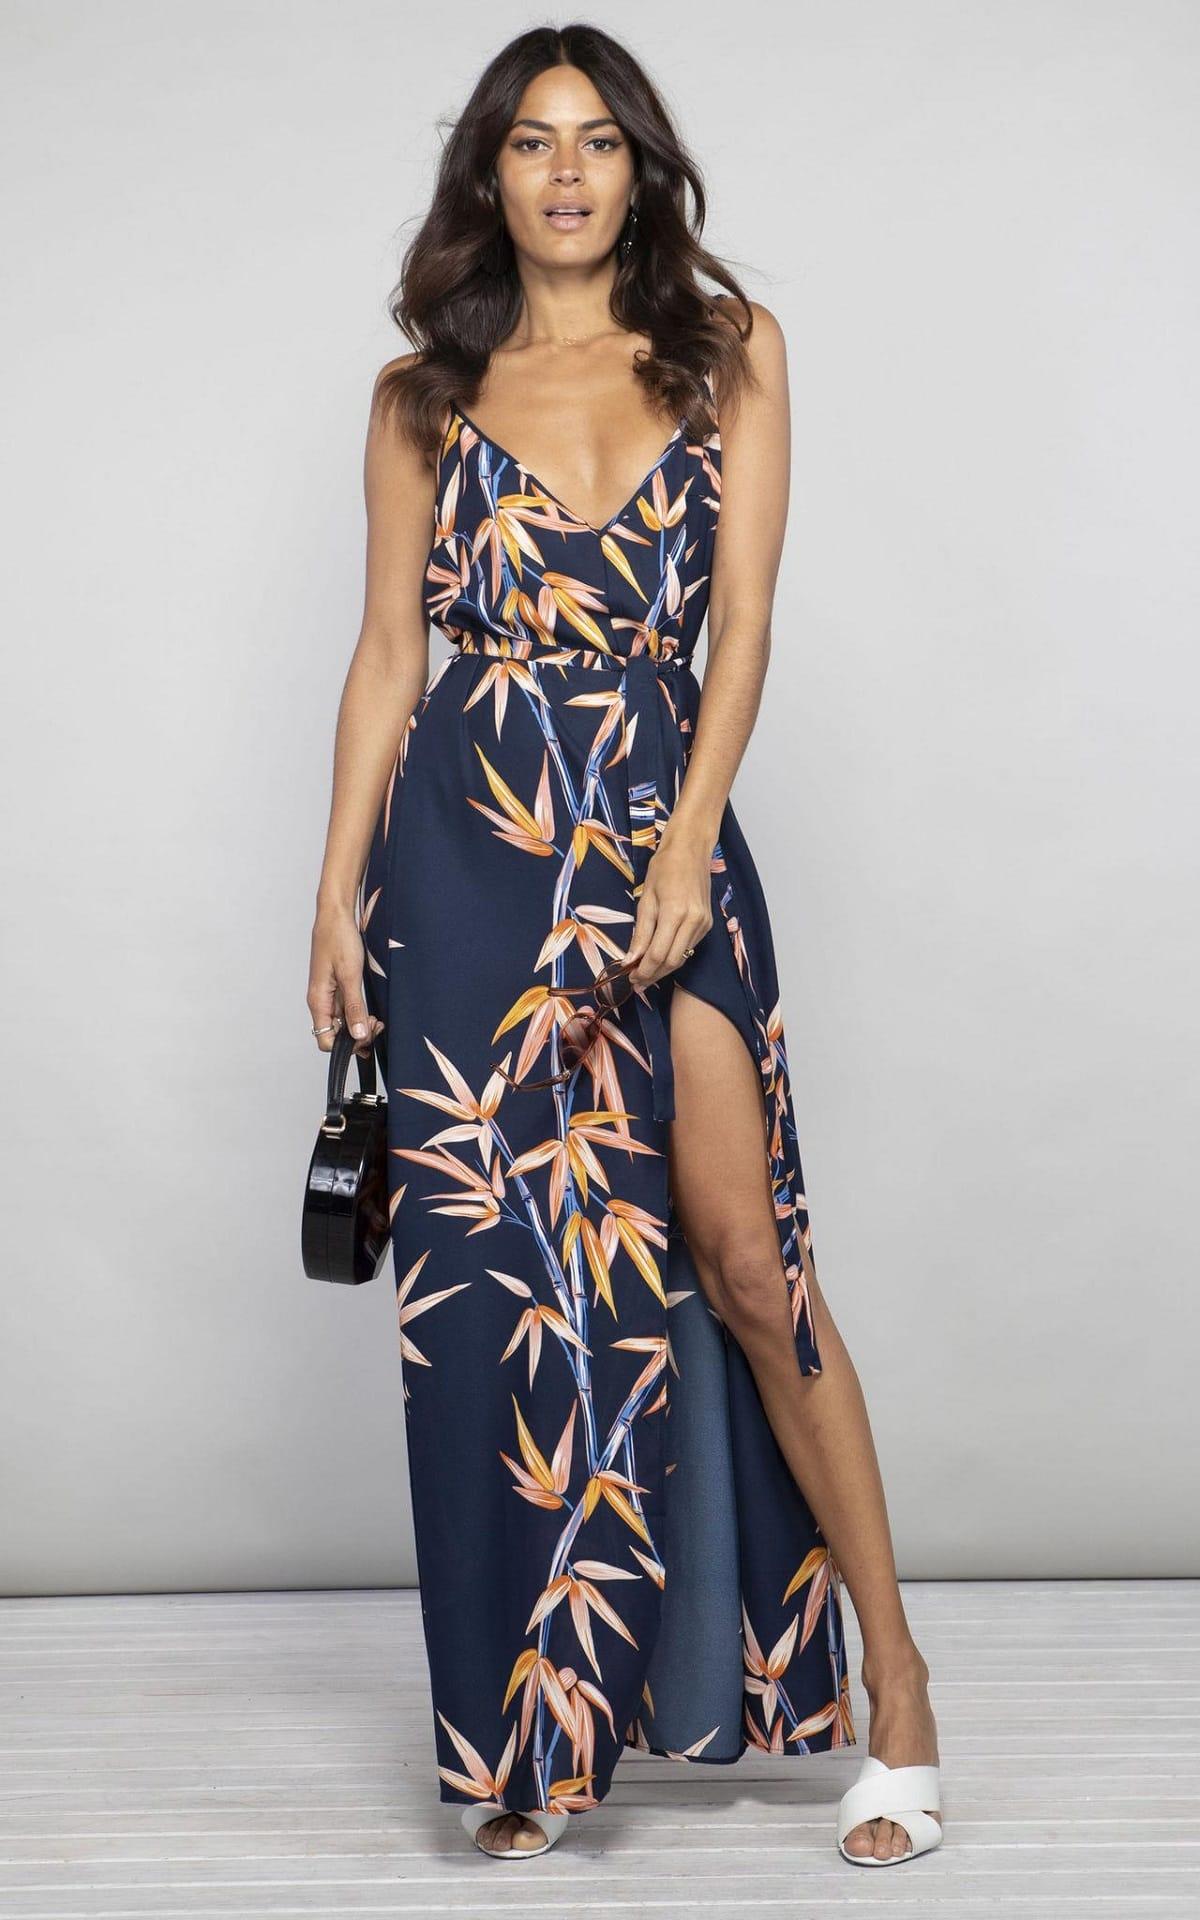 Destination Wedding Guest Styles - Spaghetti Strap Dress